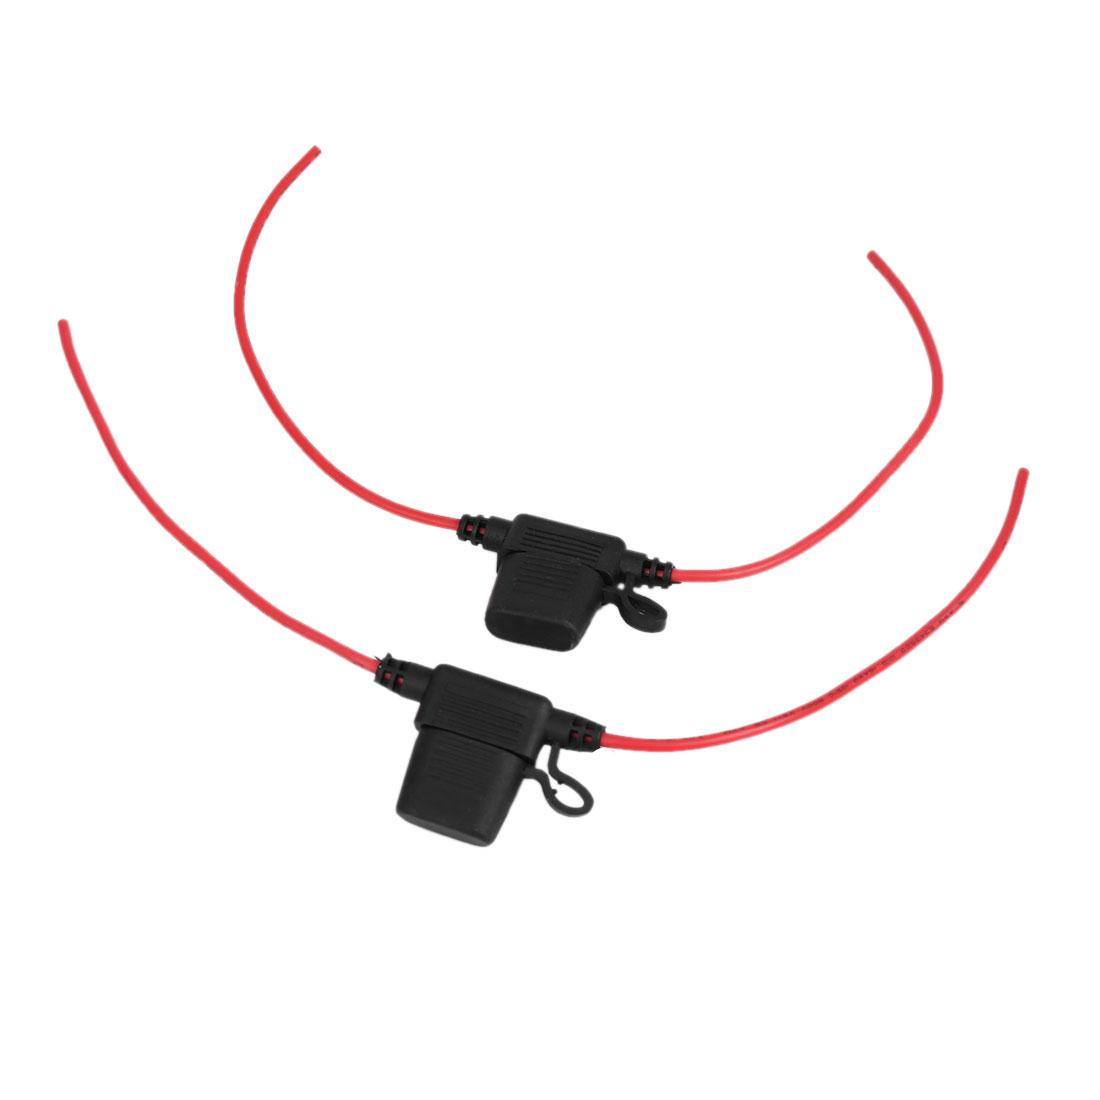 2pcs 12-24V Black Rubber T-Shape Cap Wired Inline Blade Fuse Holder for Car